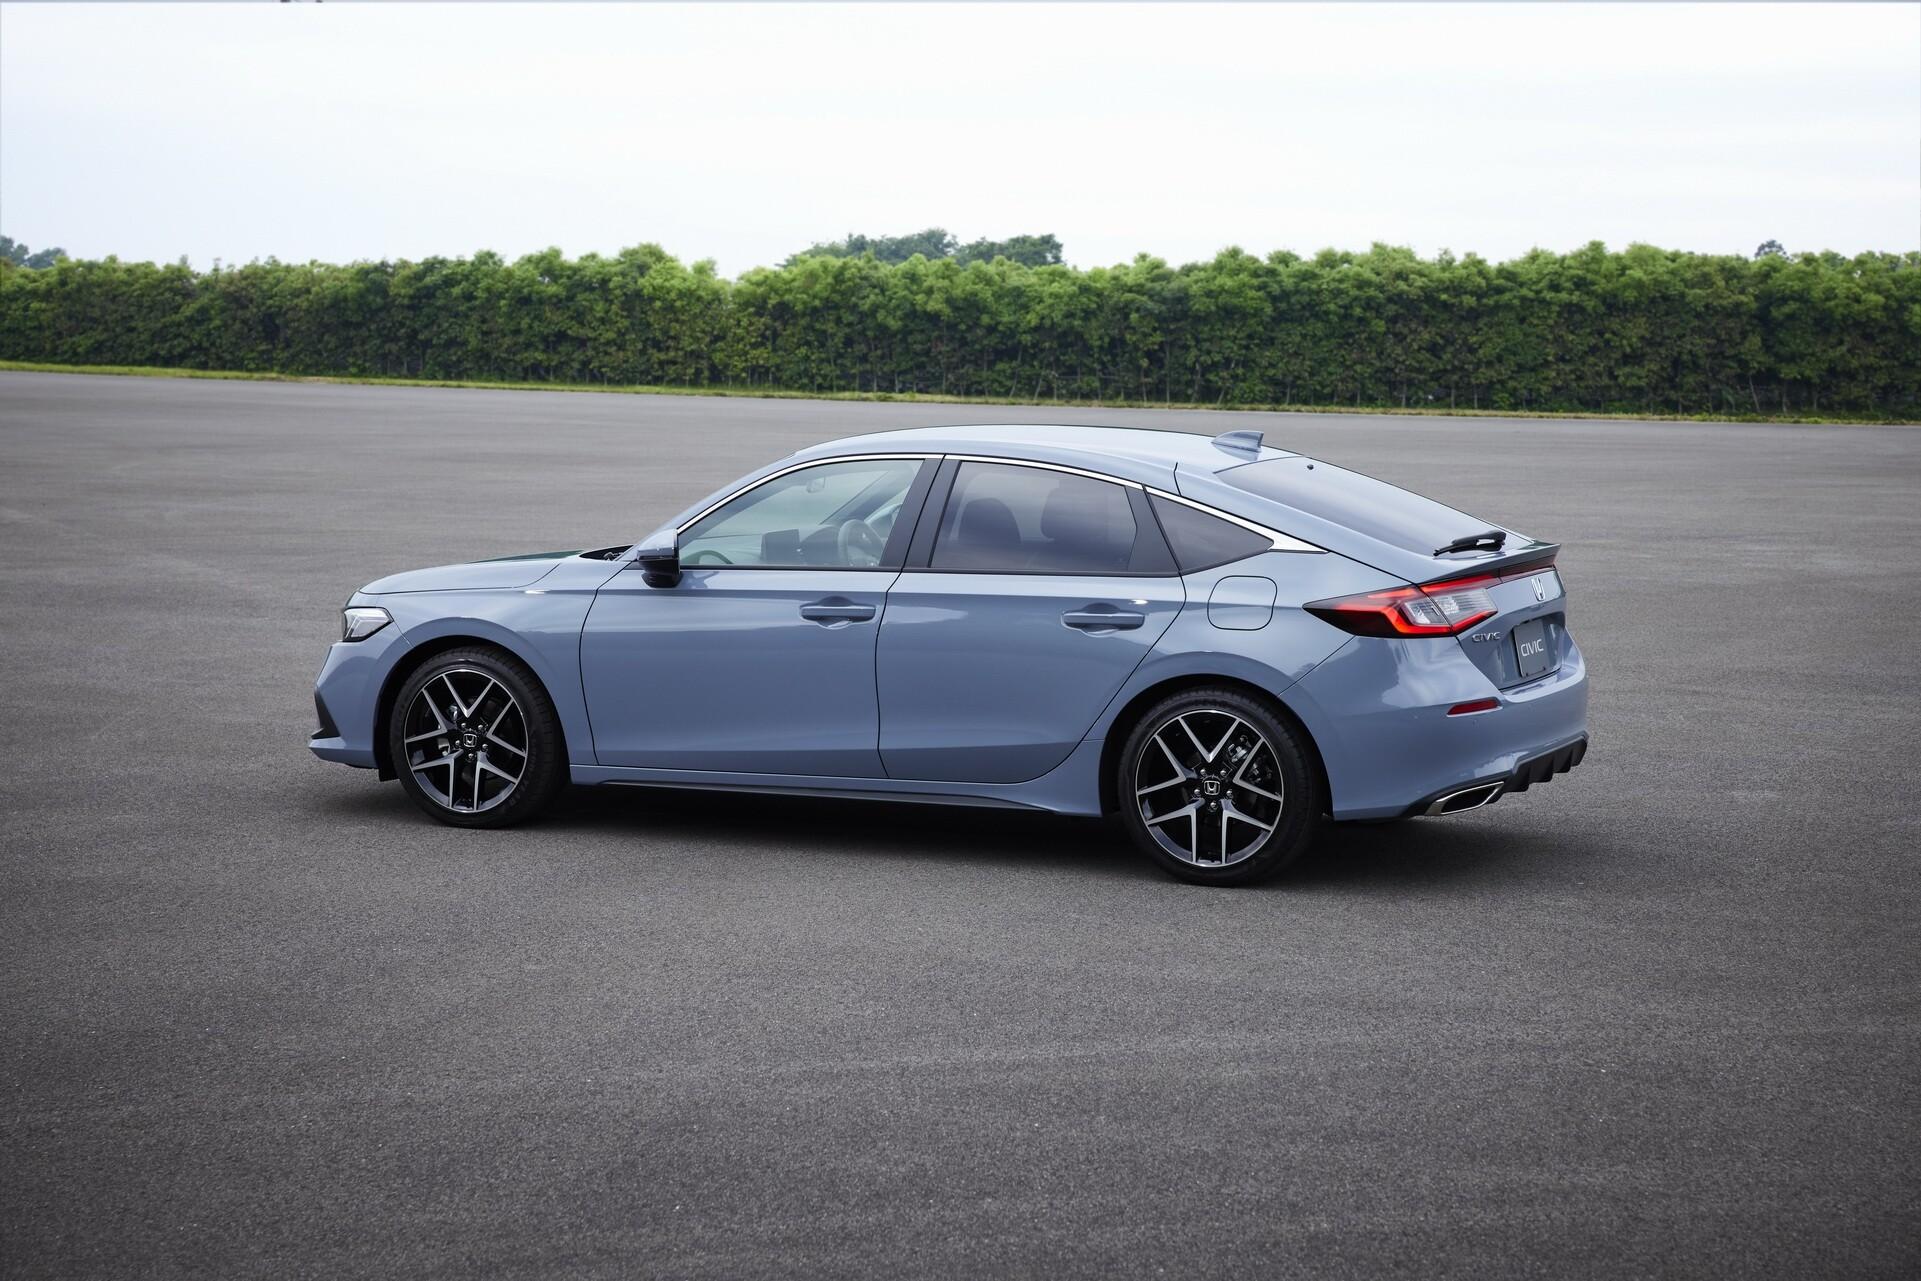 Foto de Honda Civic Hatchback 2022 (11/18)